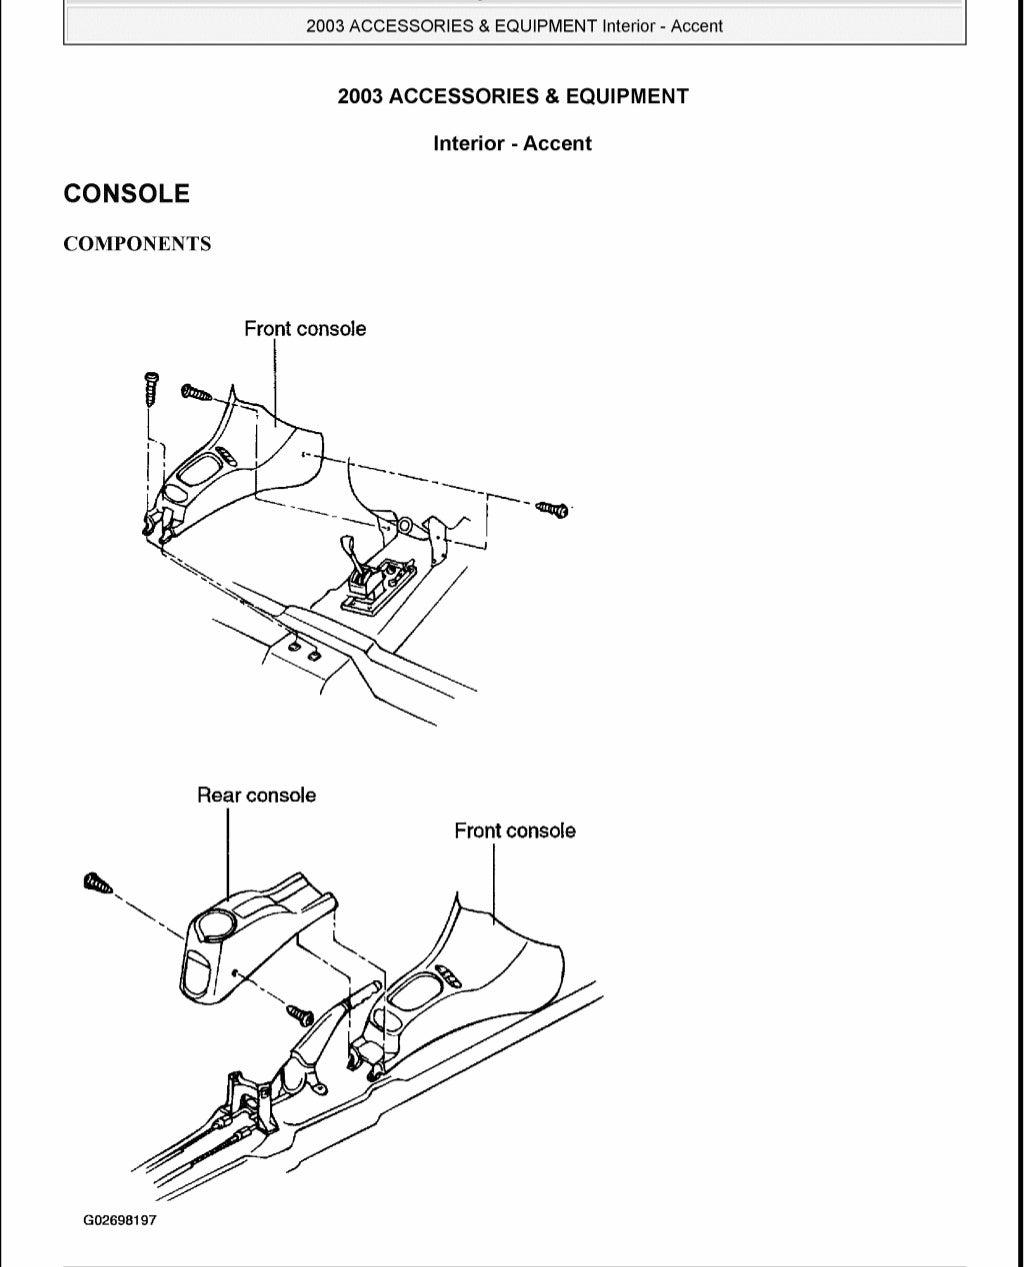 2005 Hyundai Accent Service Repair Manual